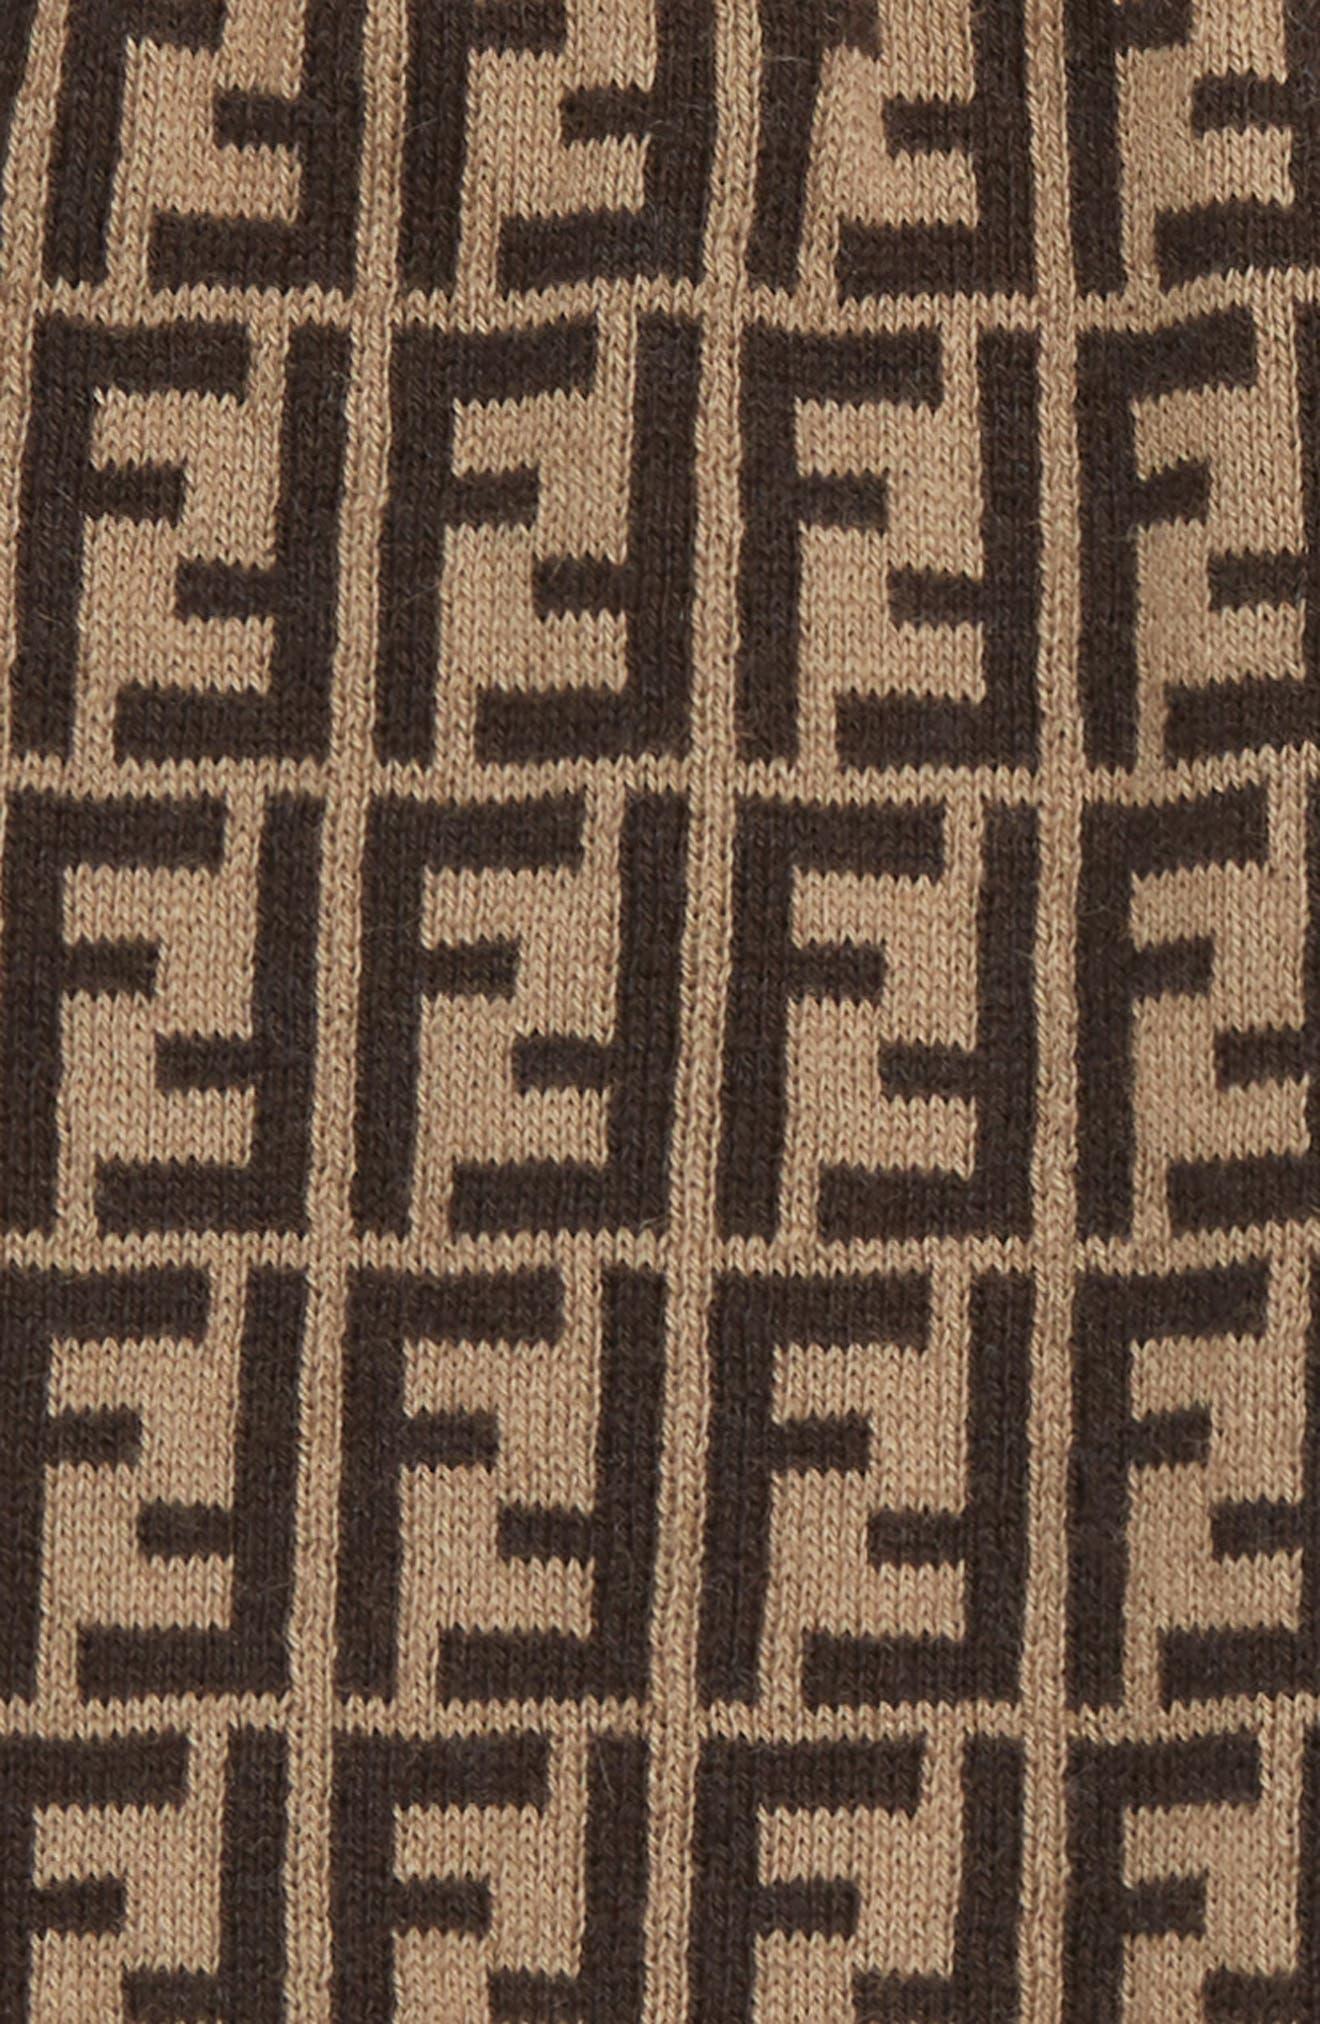 FENDI, Logo Sweater Knit Pants, Alternate thumbnail 2, color, F0LMJ BROWN